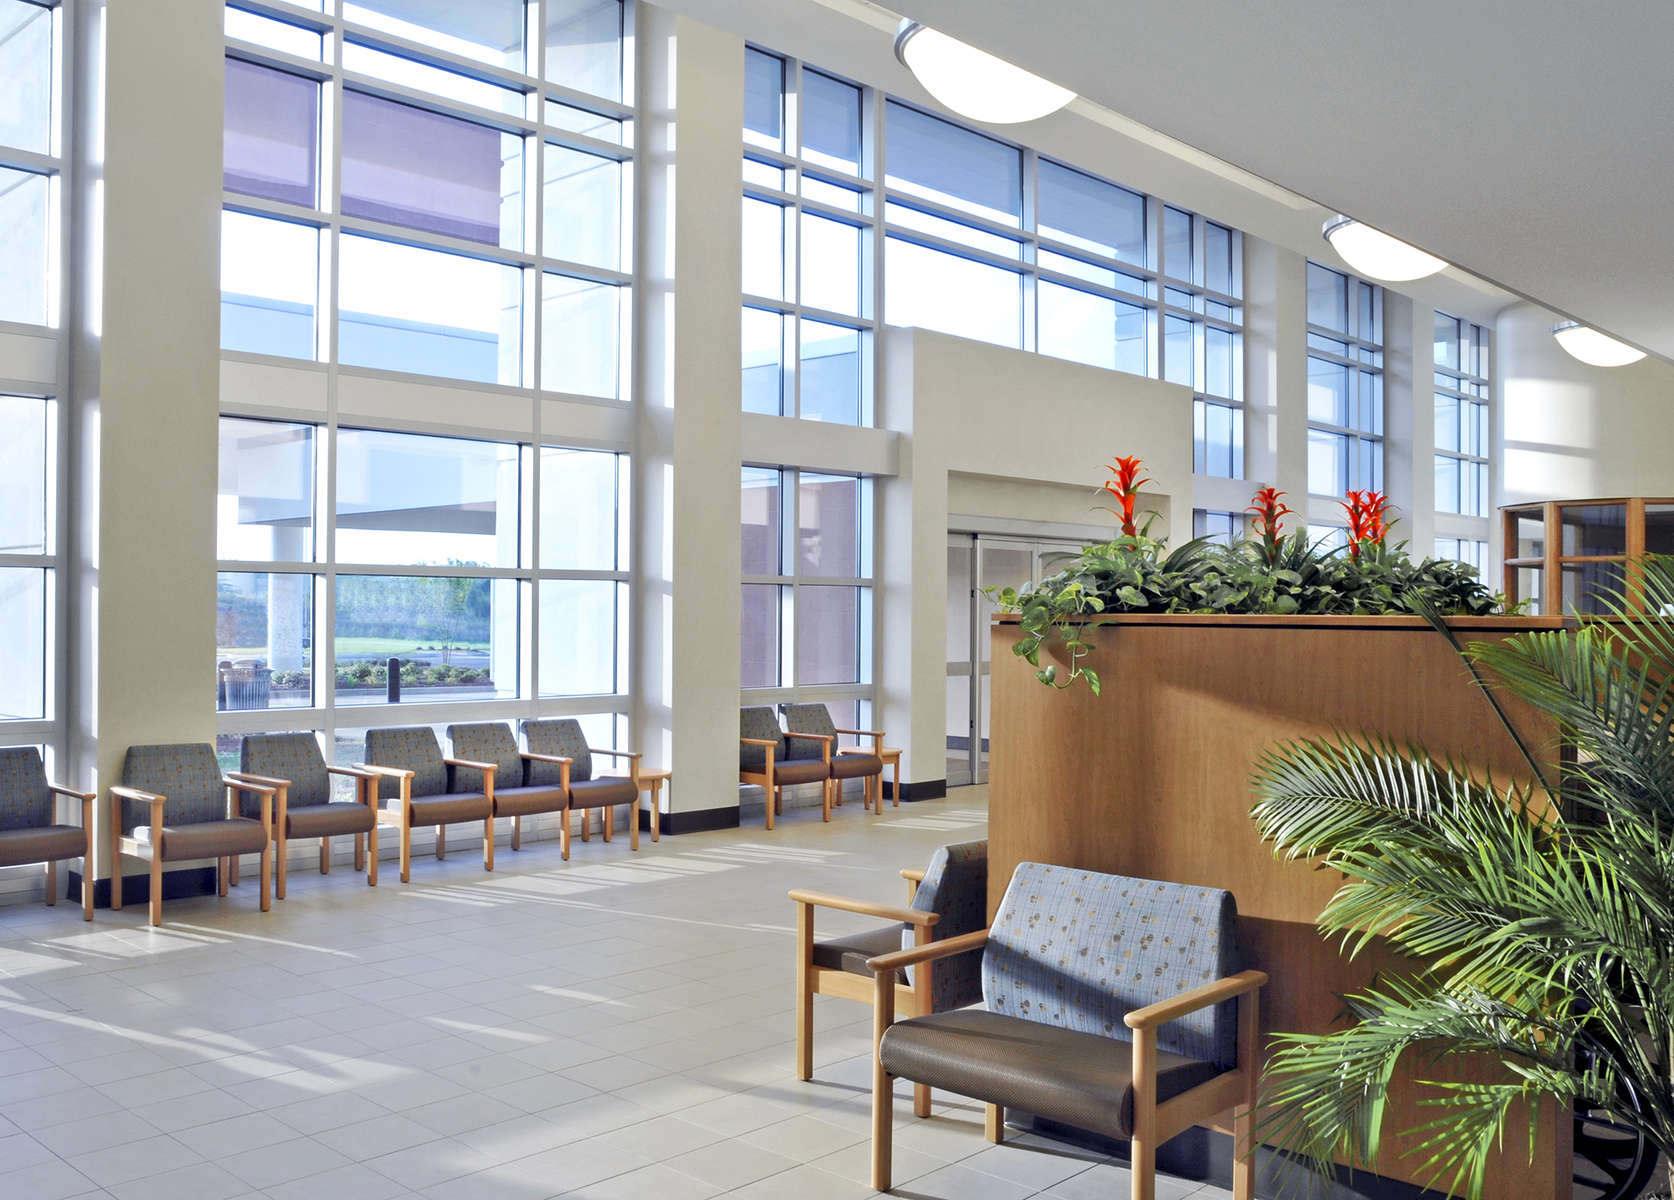 Clearview Regional Medical Center InteriorMonroe, GA